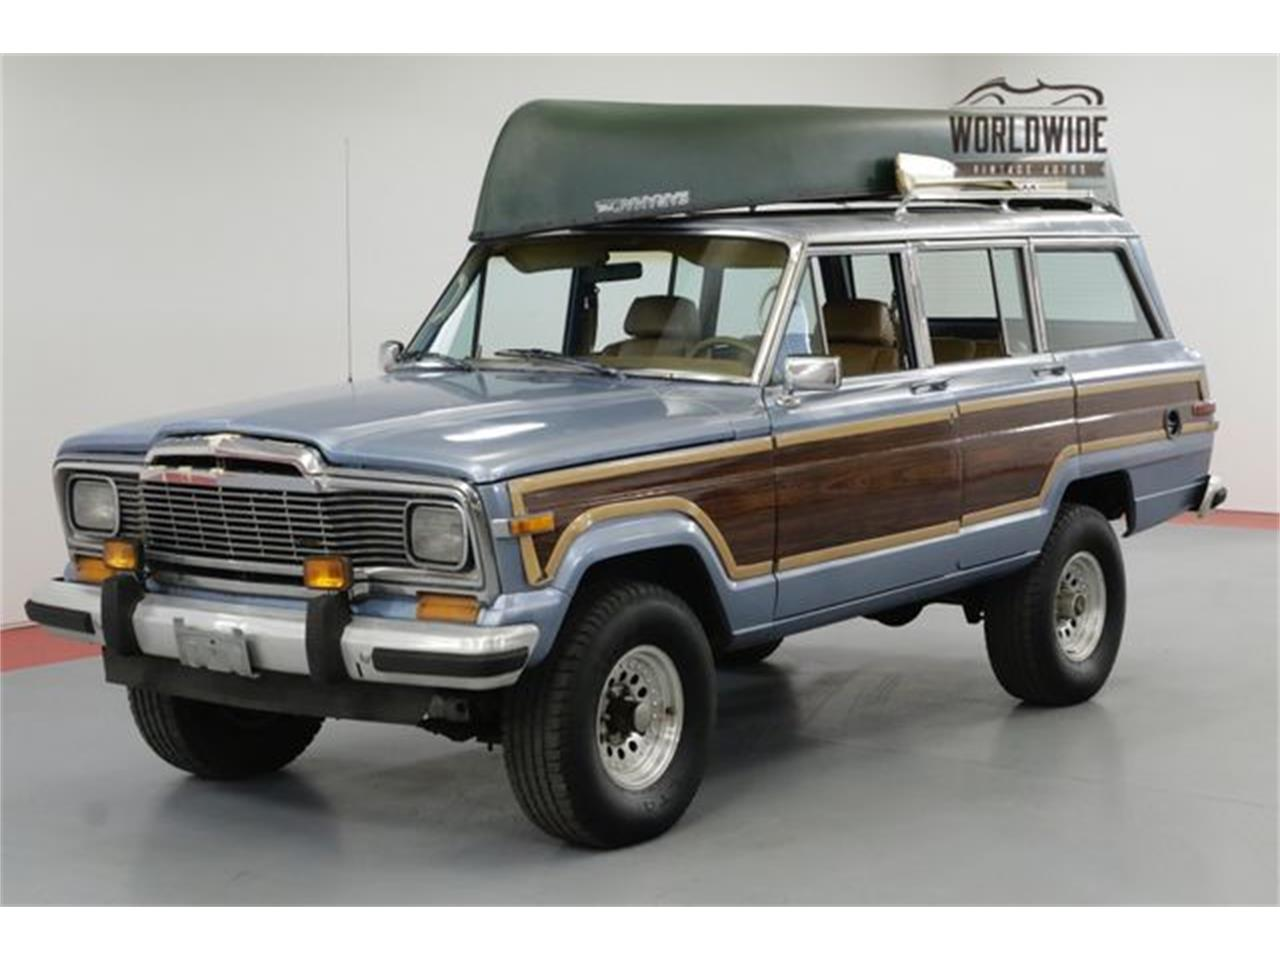 1985 jeep grand wagoneer for sale cc. Black Bedroom Furniture Sets. Home Design Ideas